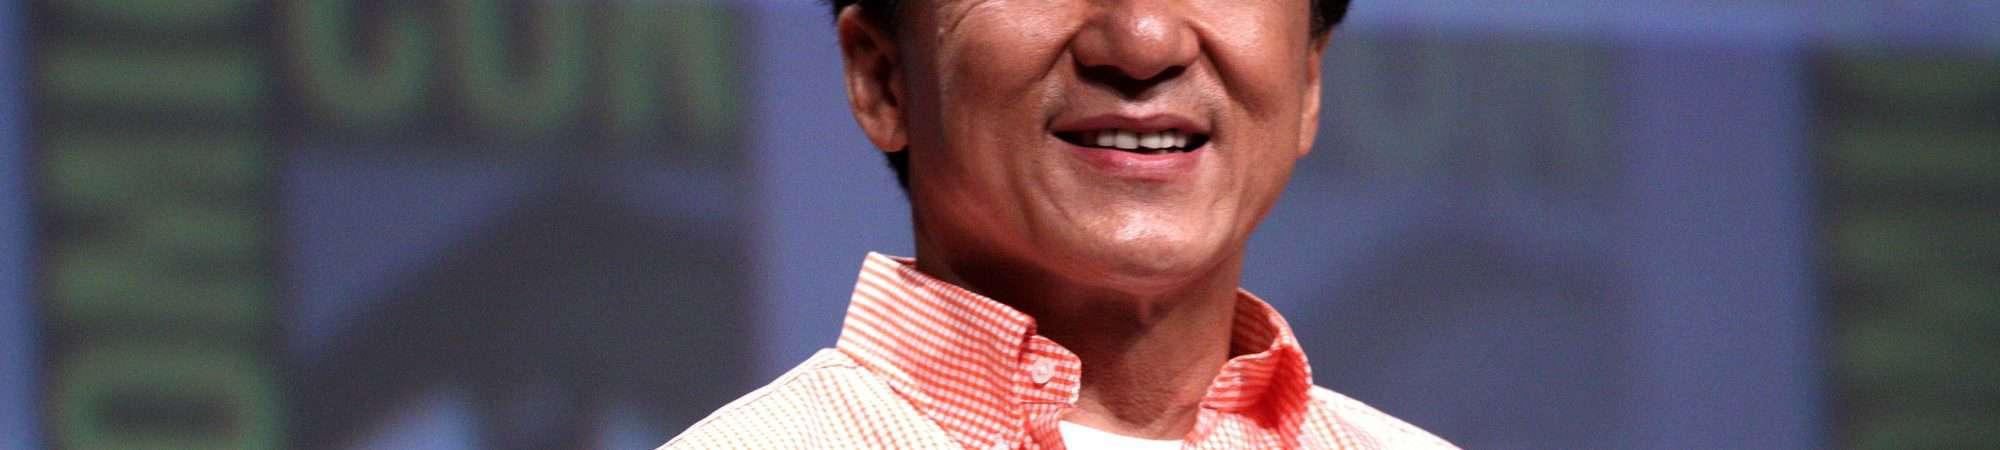 Jackie Chan na San Diego Comic Con